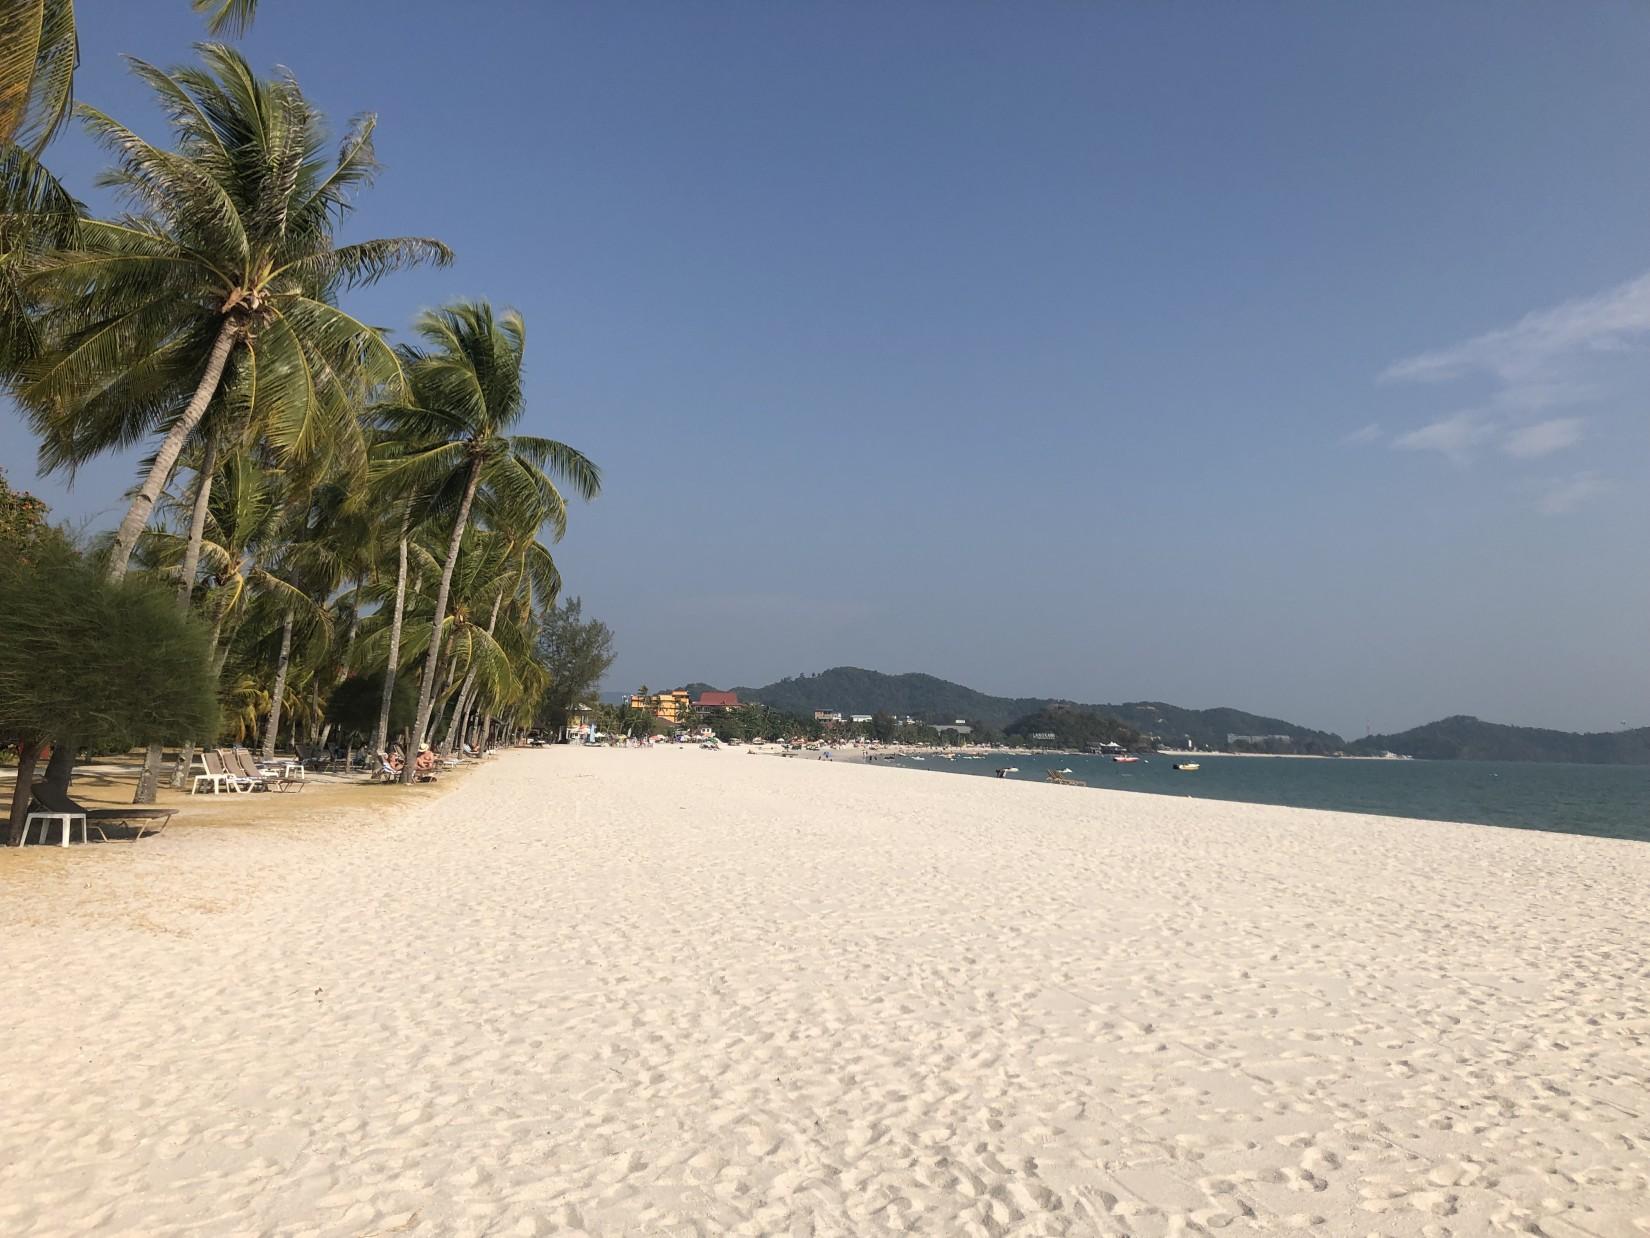 Cenang Beach, Langkawi, Malaysia